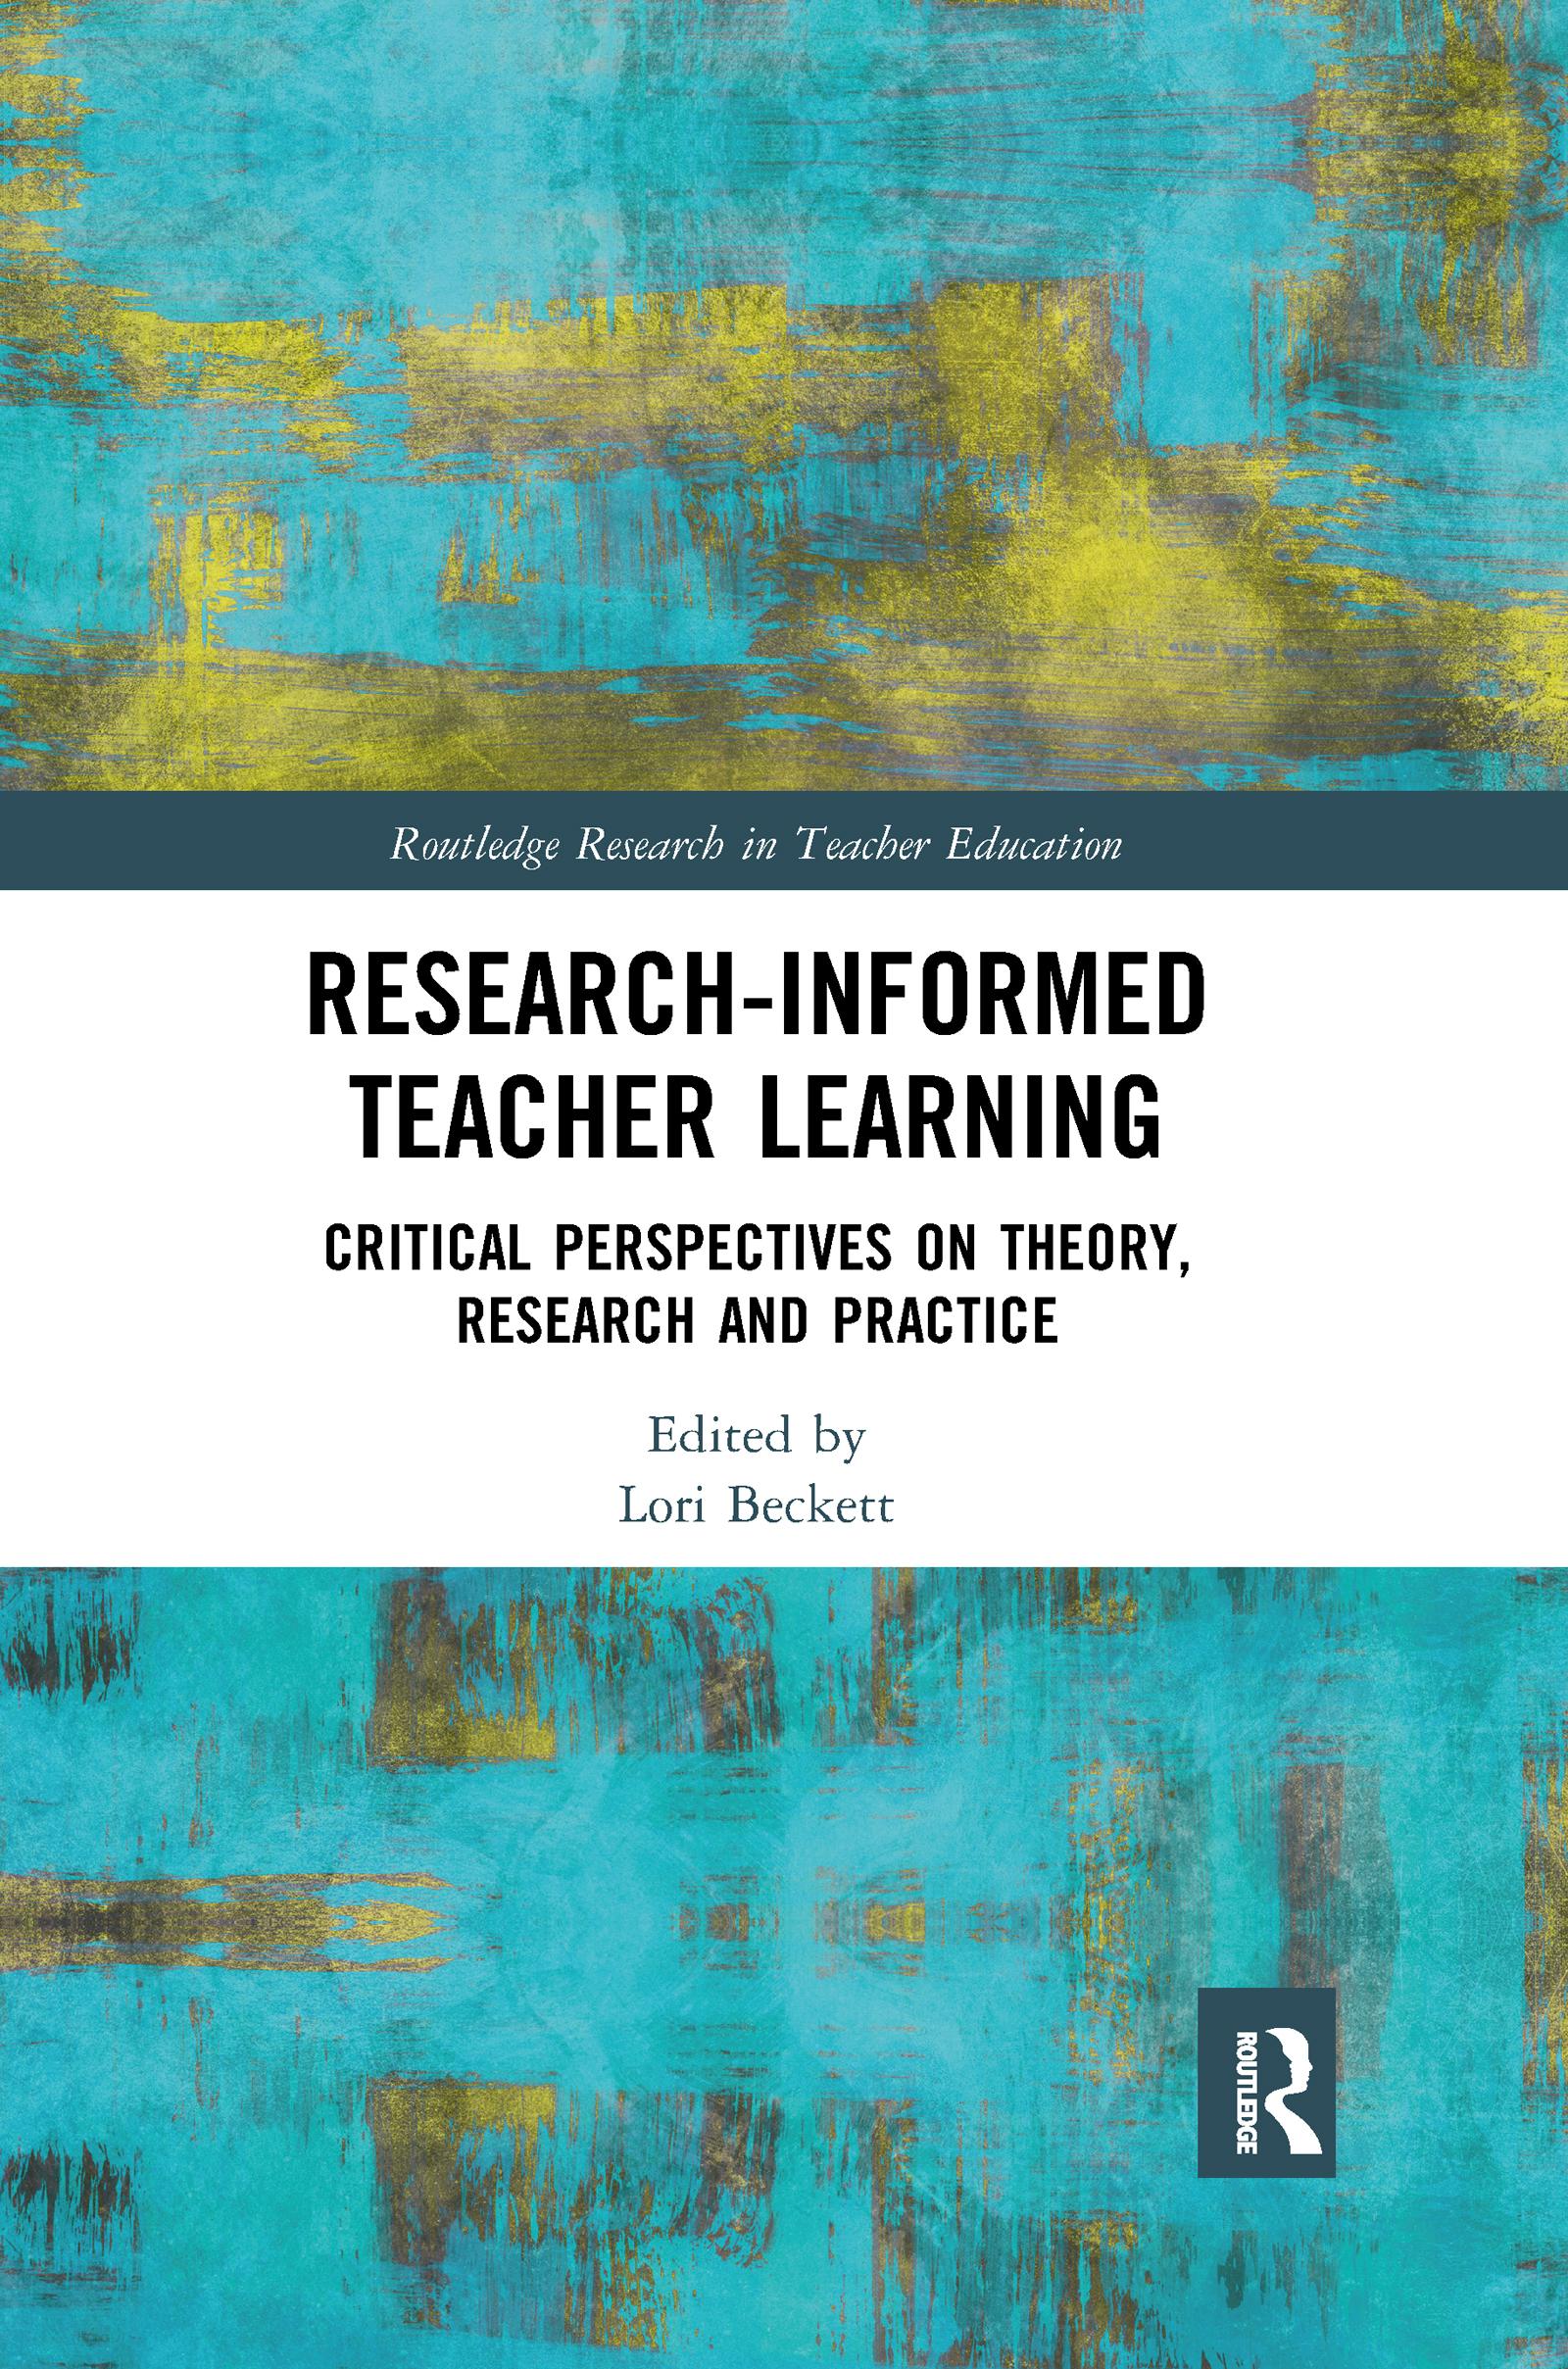 Research-Informed Teacher Learning